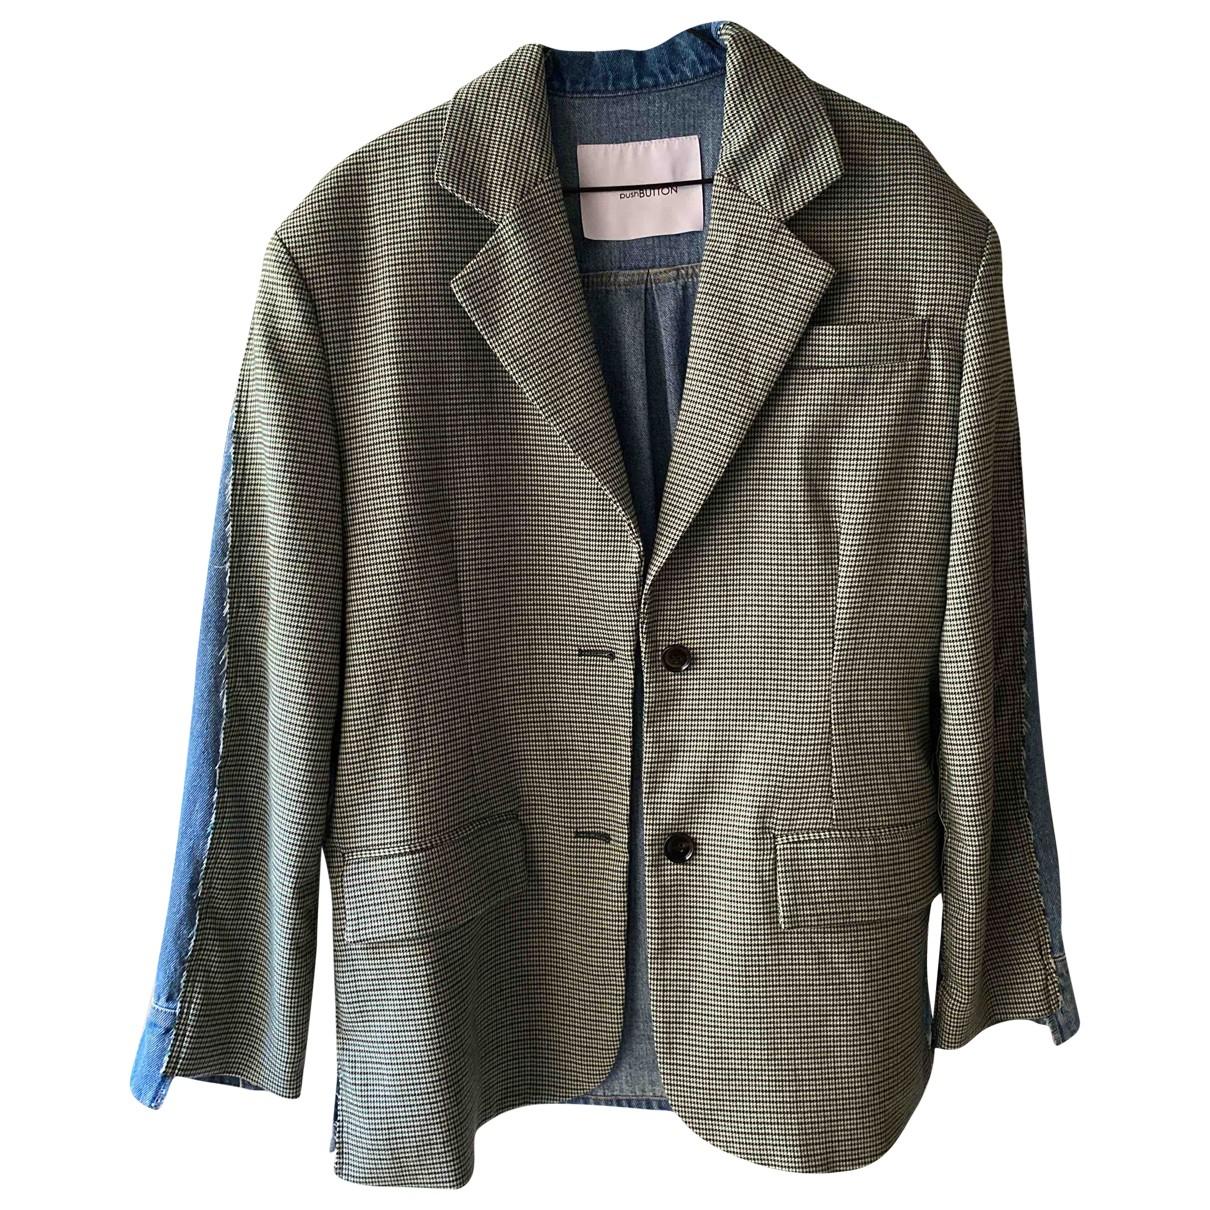 Pushbutton \N Multicolour jacket  for Men M International